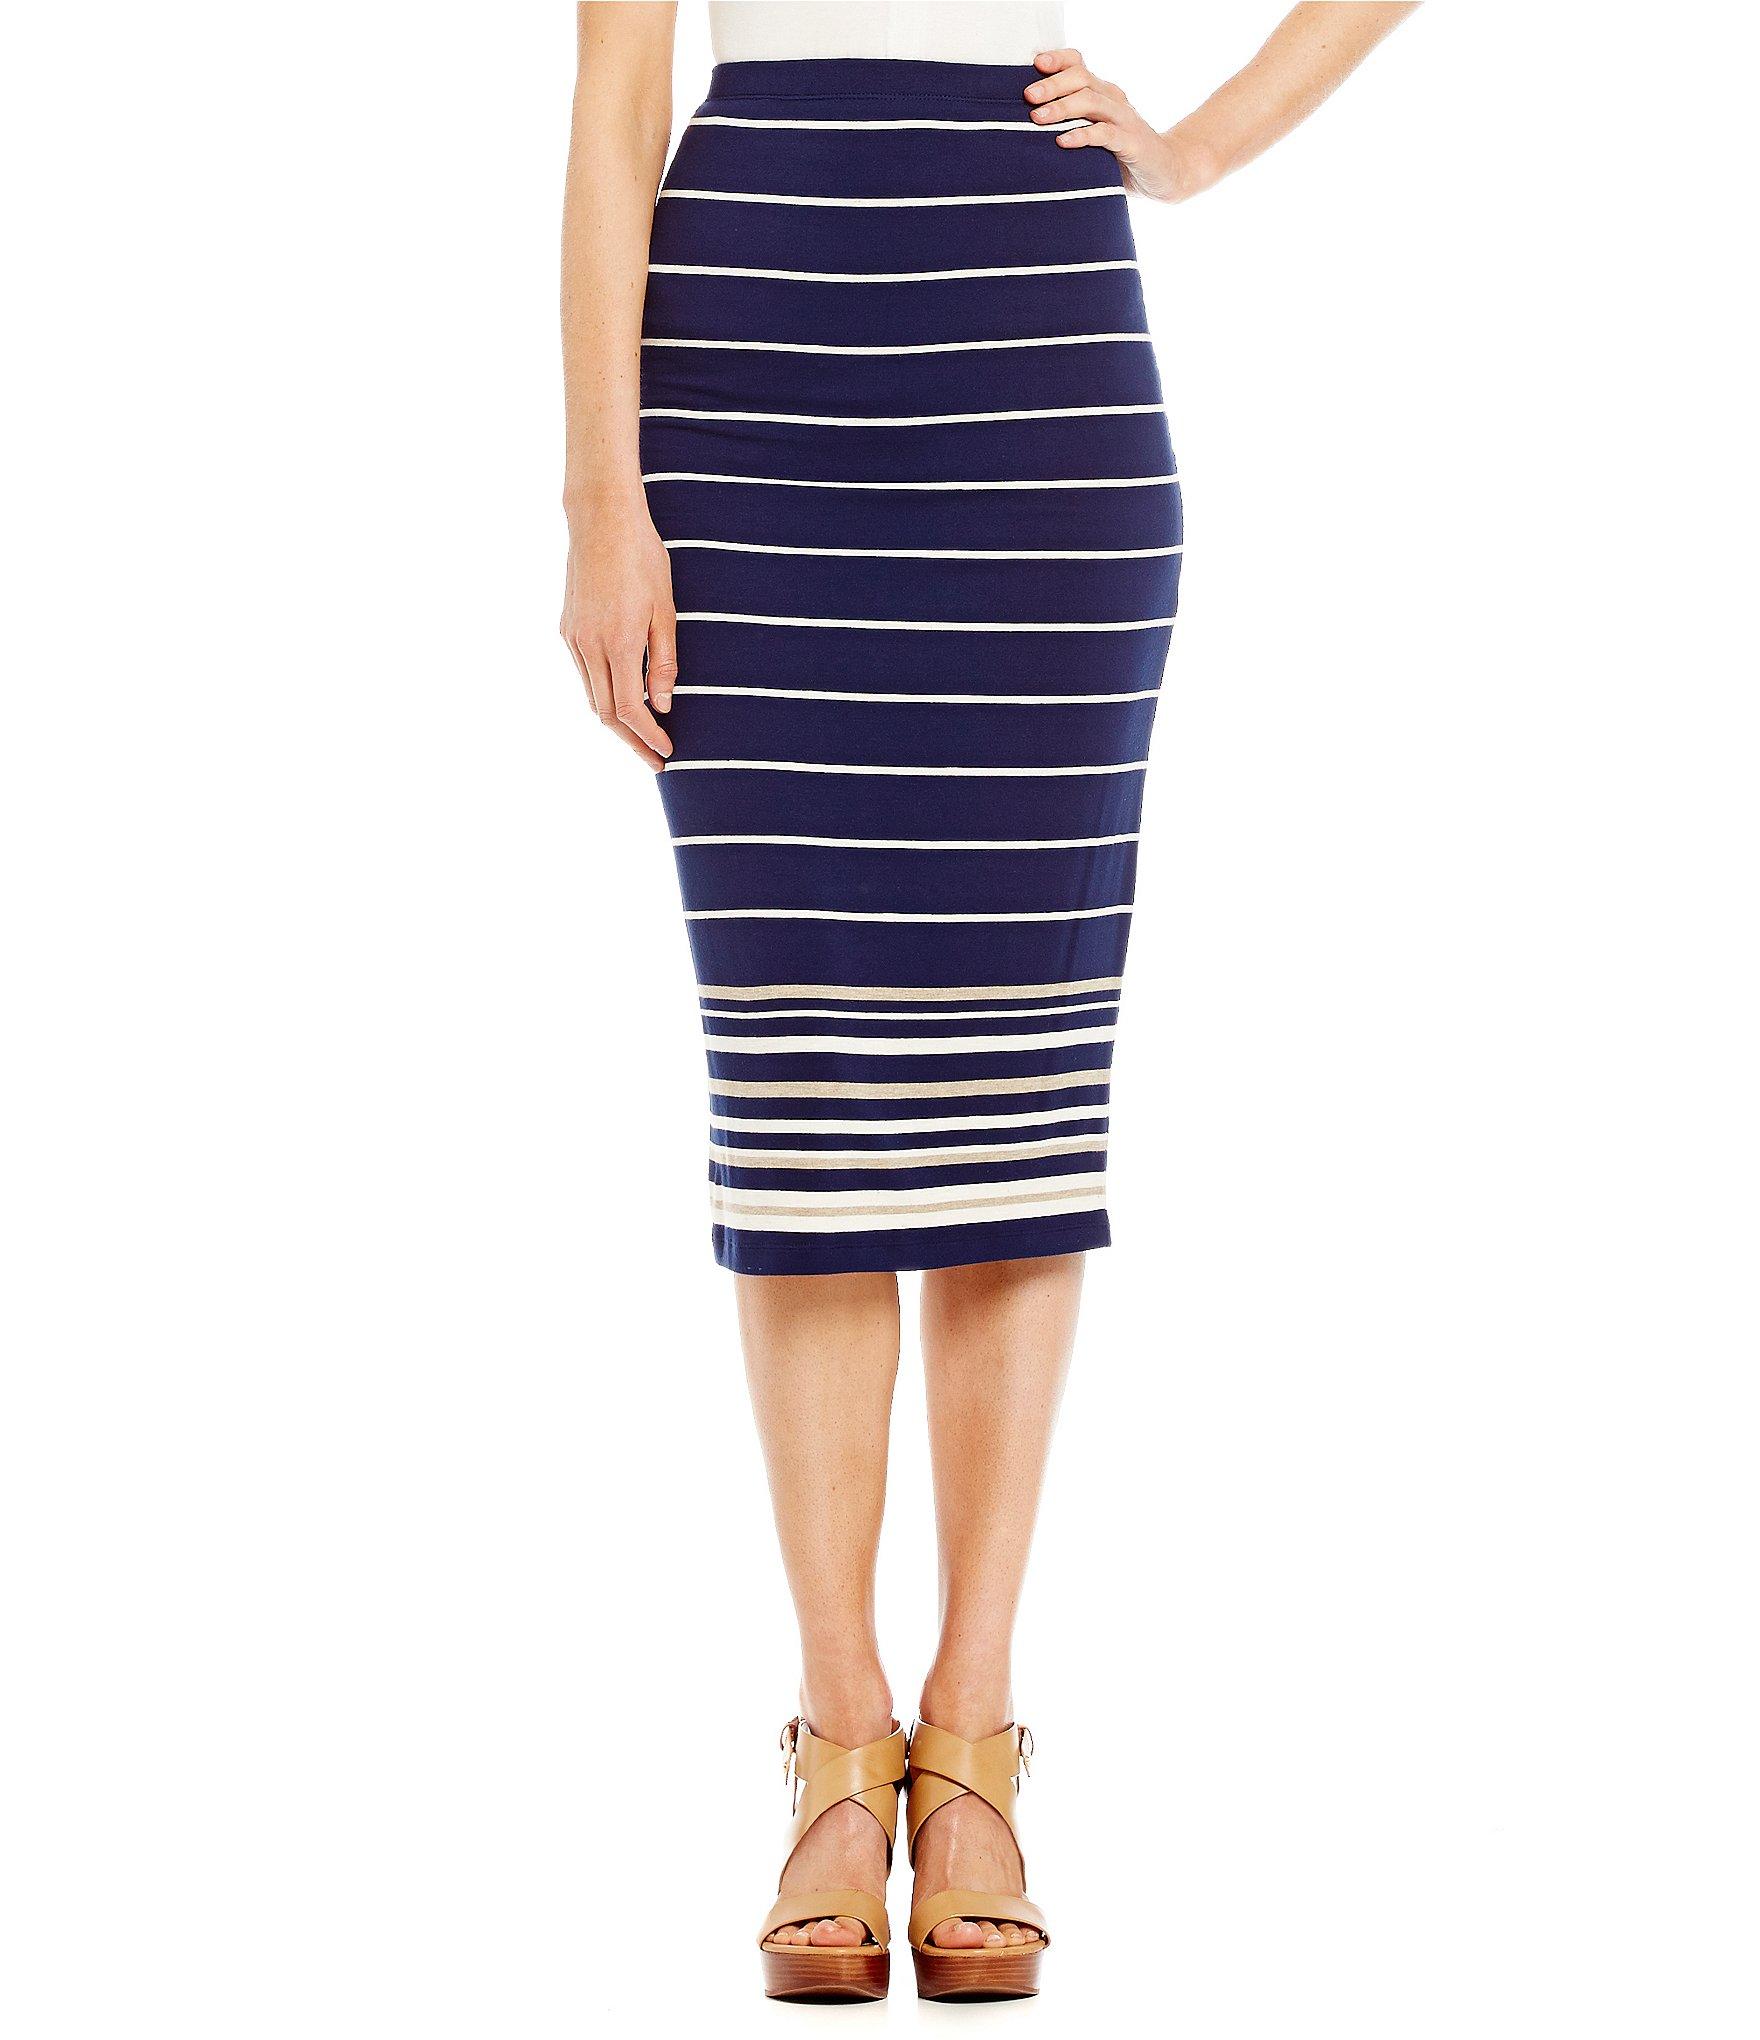 m s s p striped knit jersey pencil skirt dillards